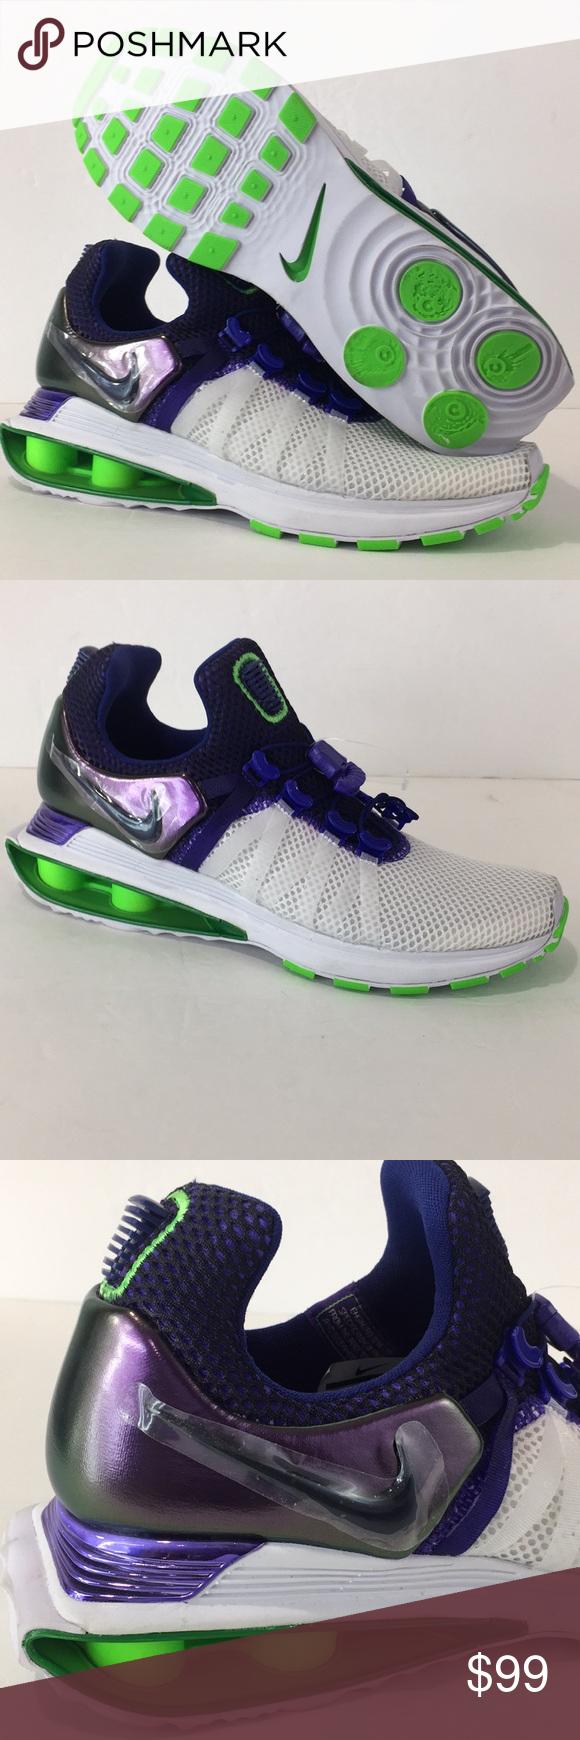 premium selection 64f6e 6563e Nike gravity Women s Sneakers Brand new without box Nike Shox Gravity Fit   Women s Color